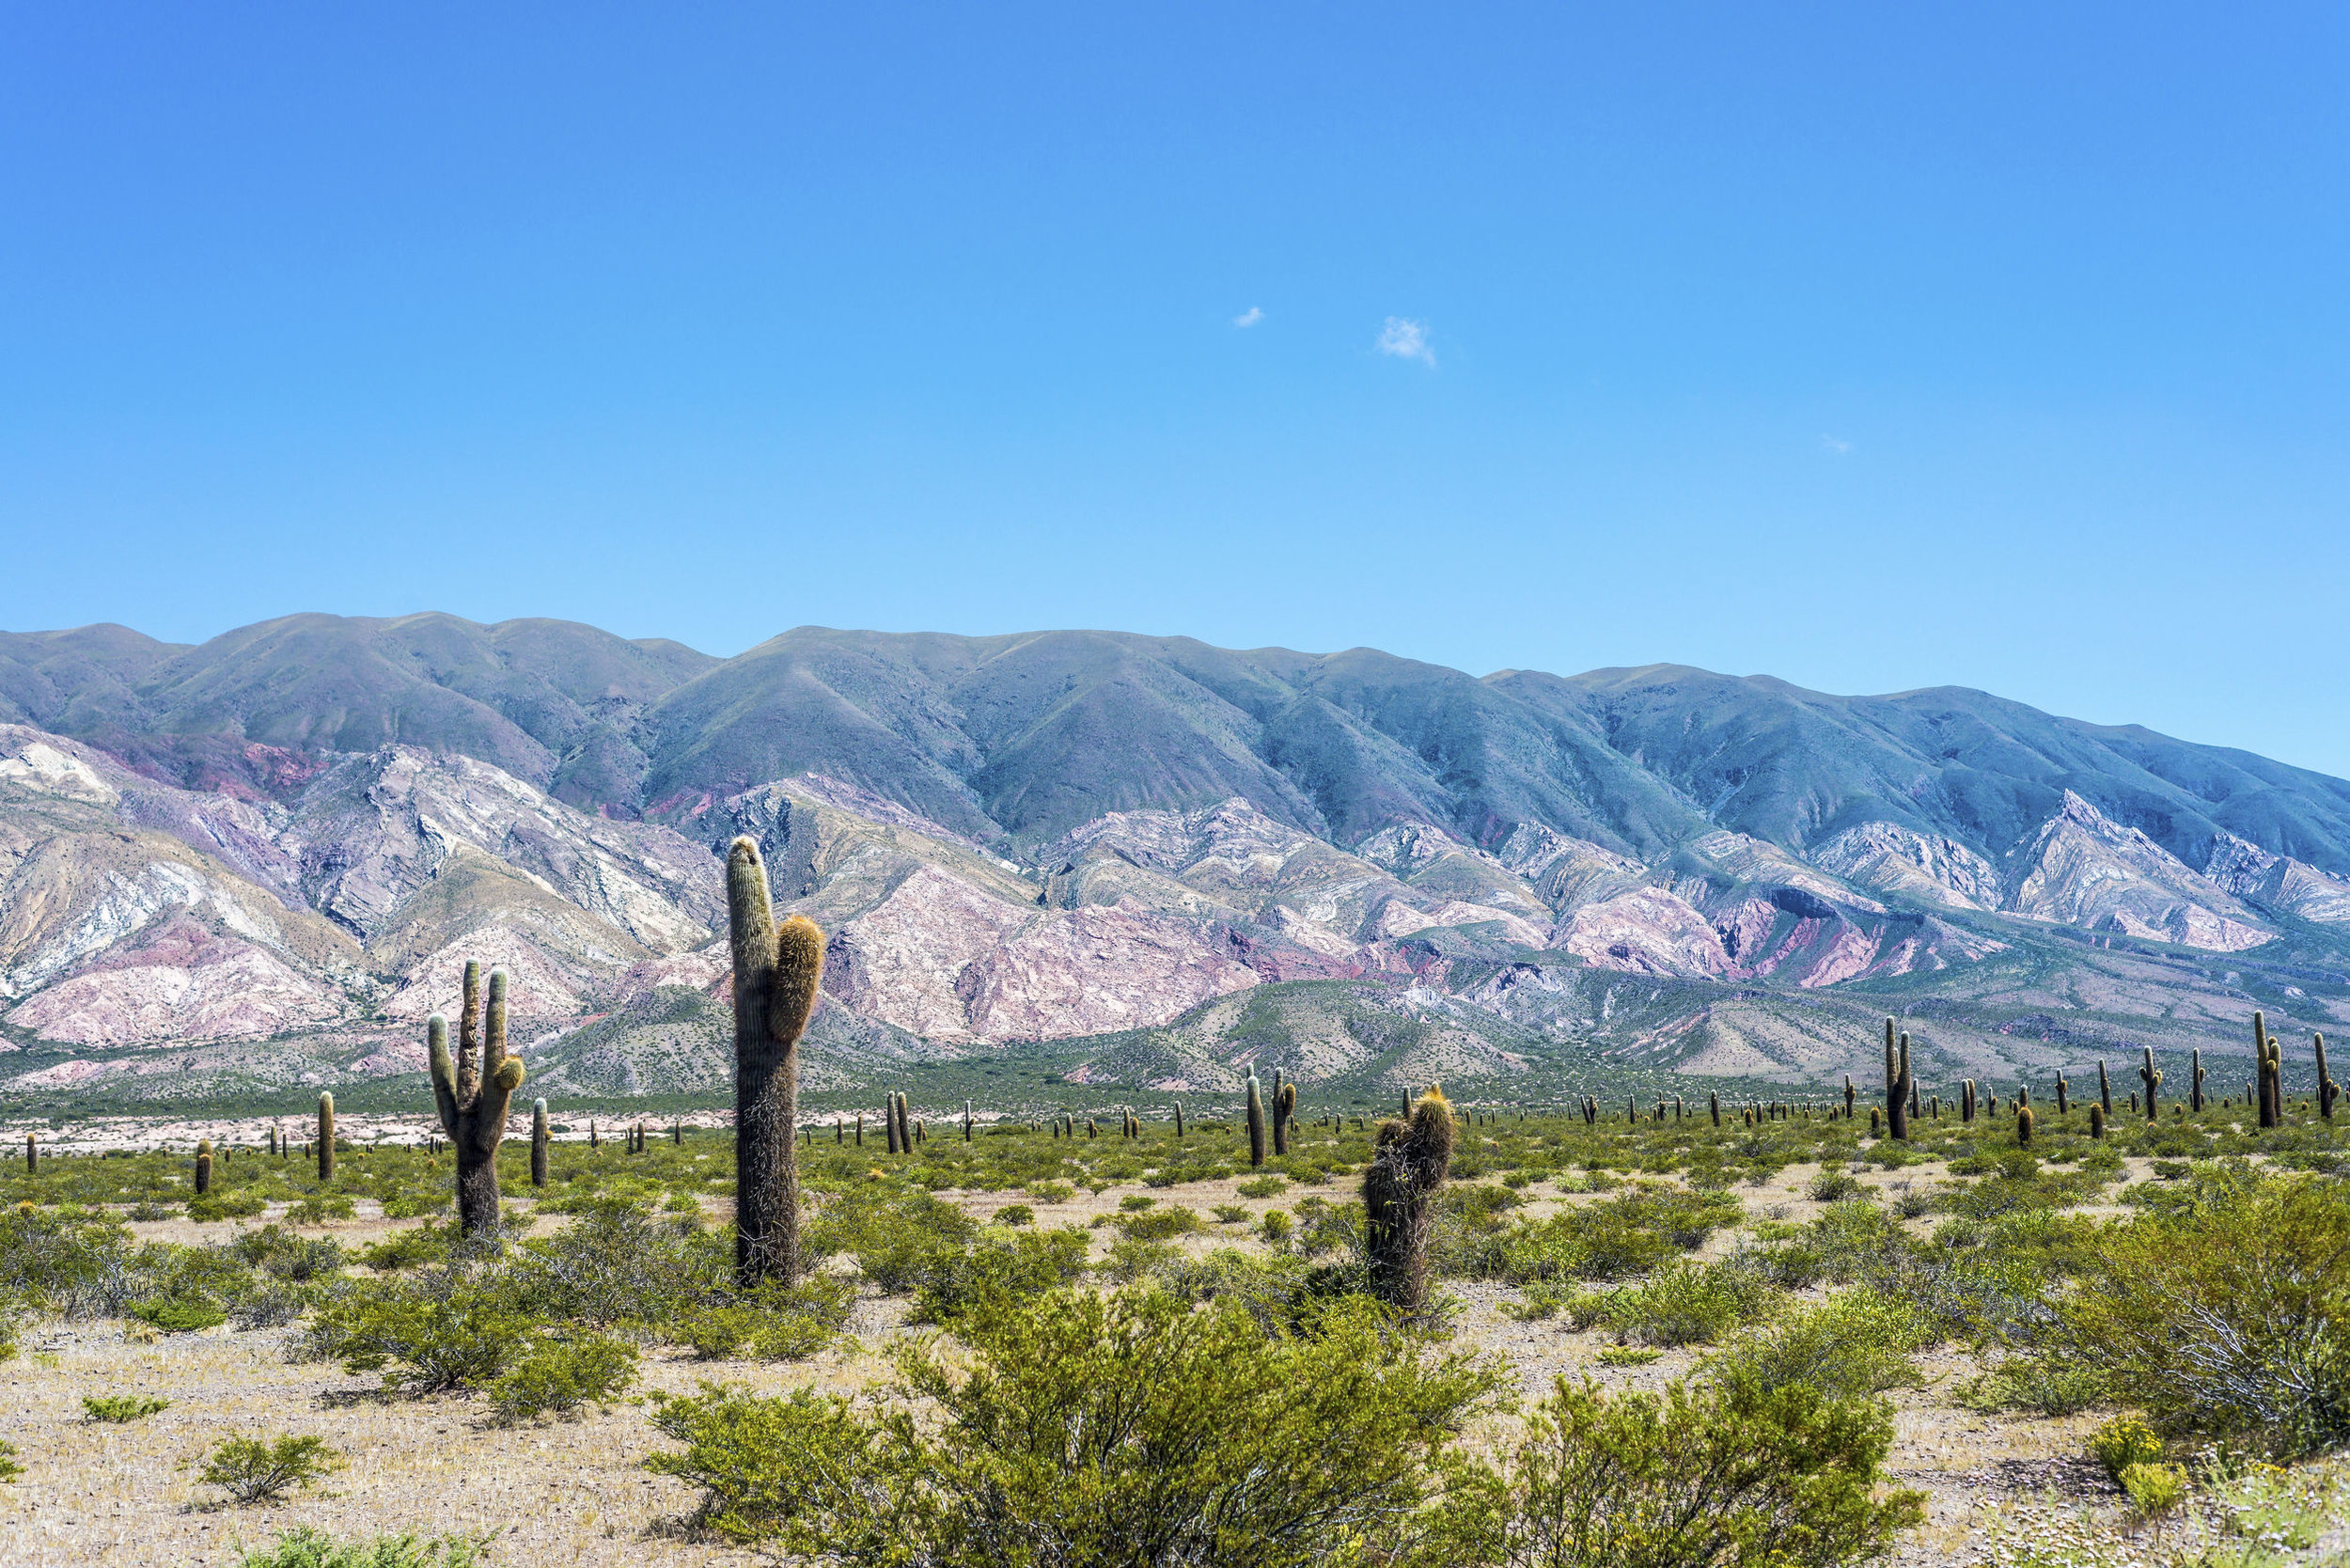 Kultur og storslåtte naturopplevelser - opplev Chile, Argentina og Uruguay